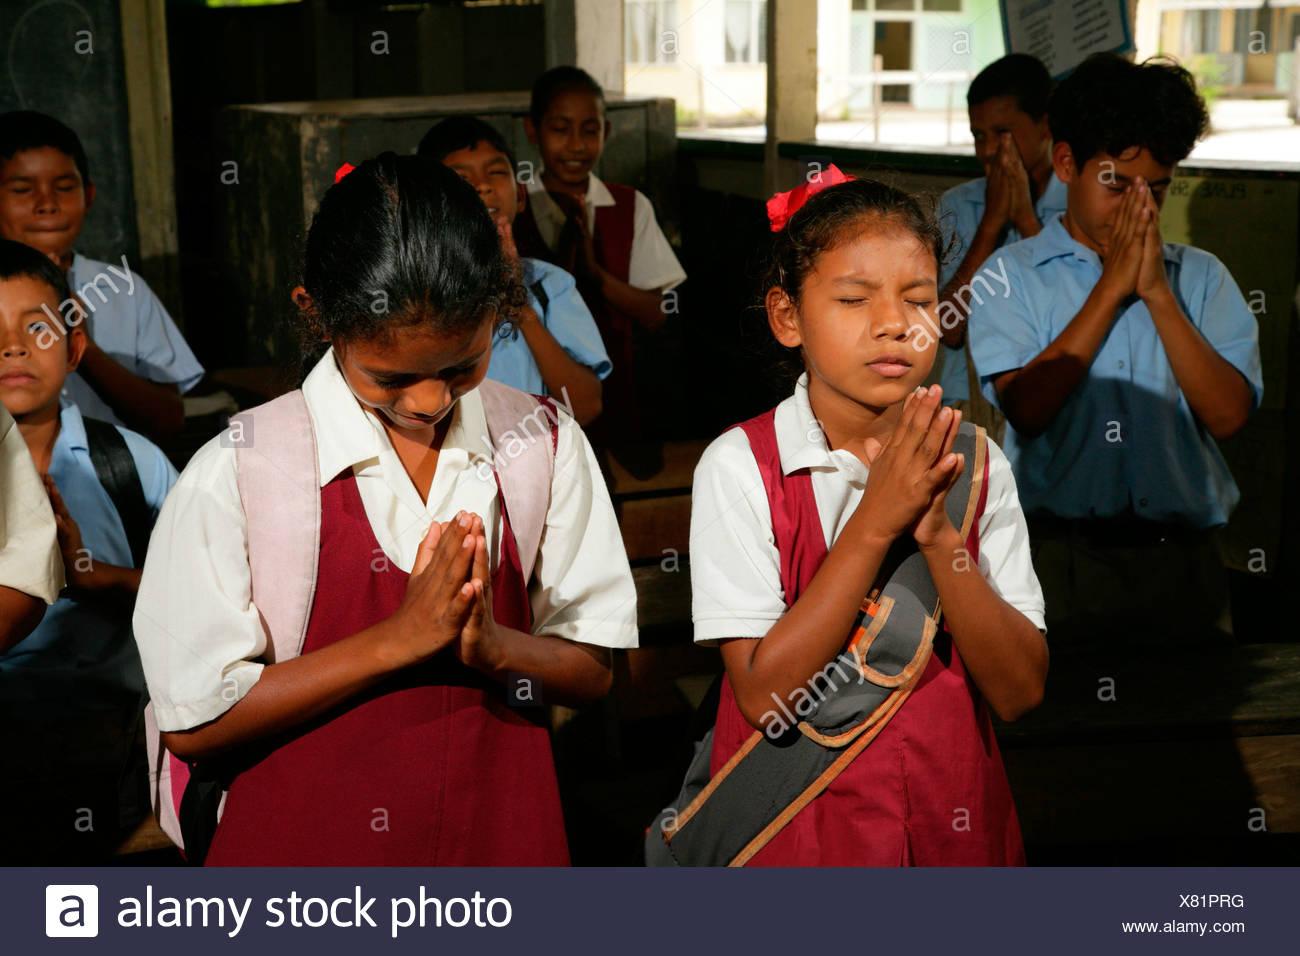 Schoolchildren reciting morning prayers, Arawak natives, Santa Mission, Guyana, South America - Stock Image